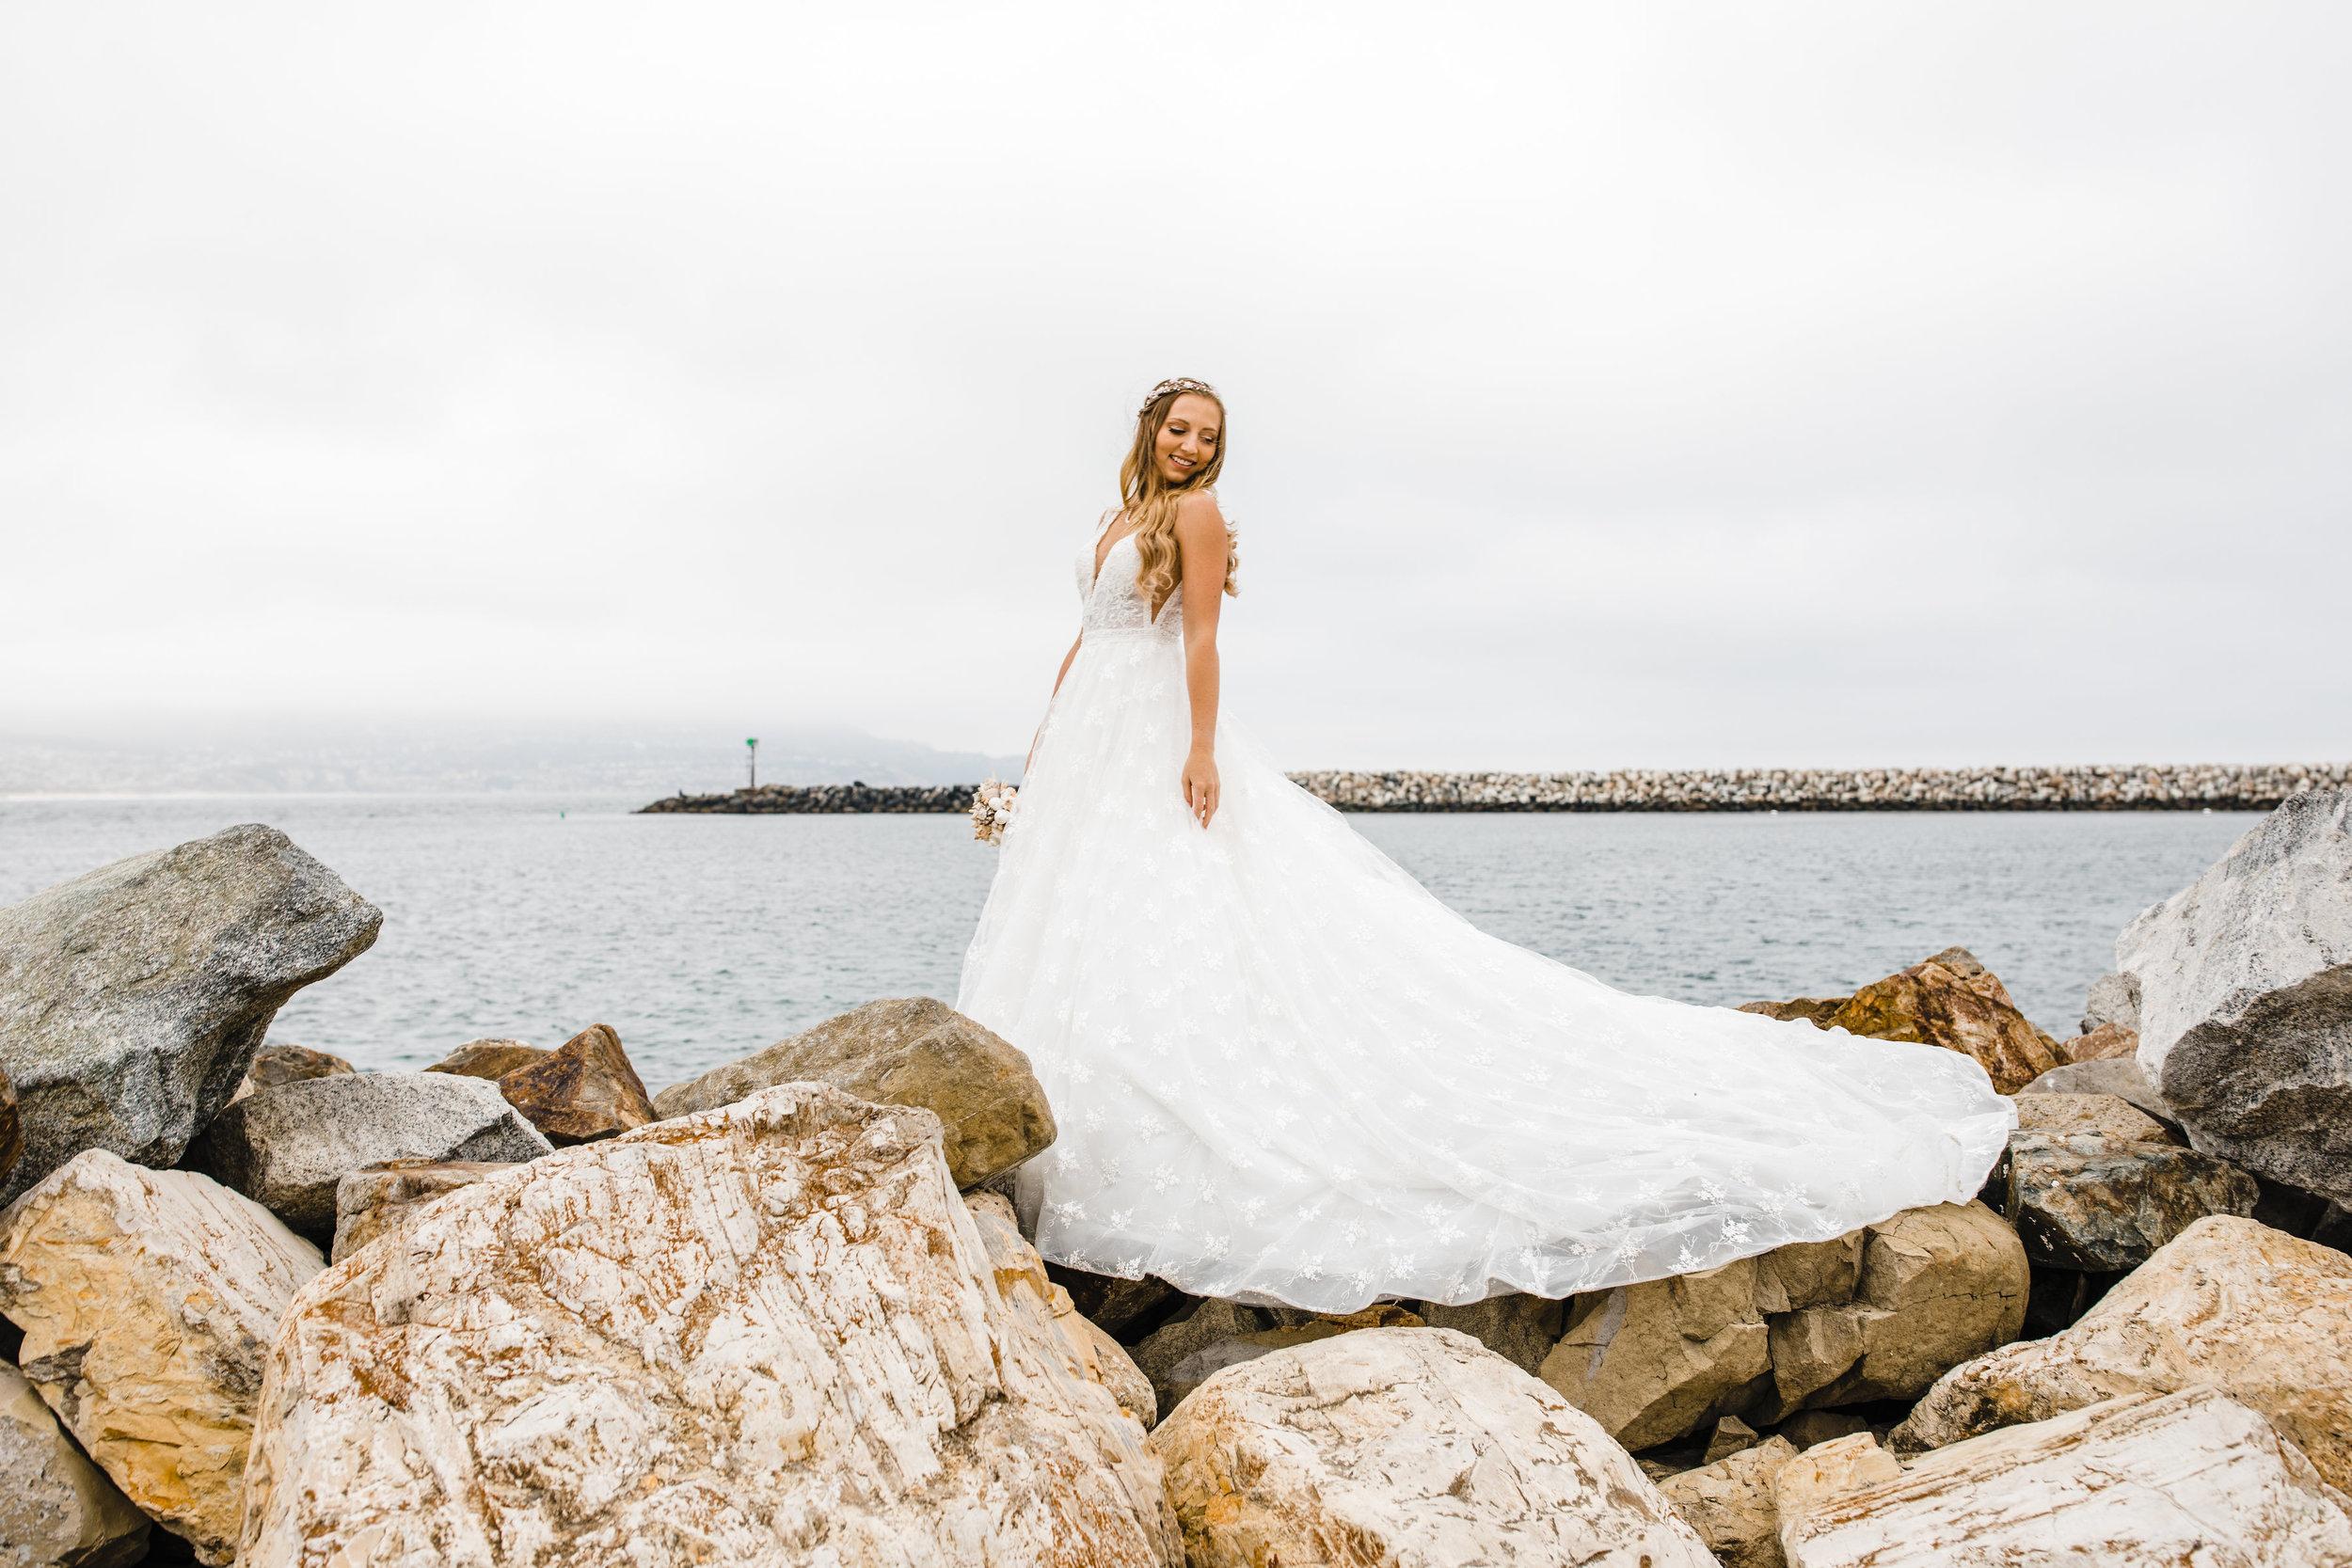 professional wedding photographer in westminister colorado long wedding train beach wedding dress beachfront bridals seascape